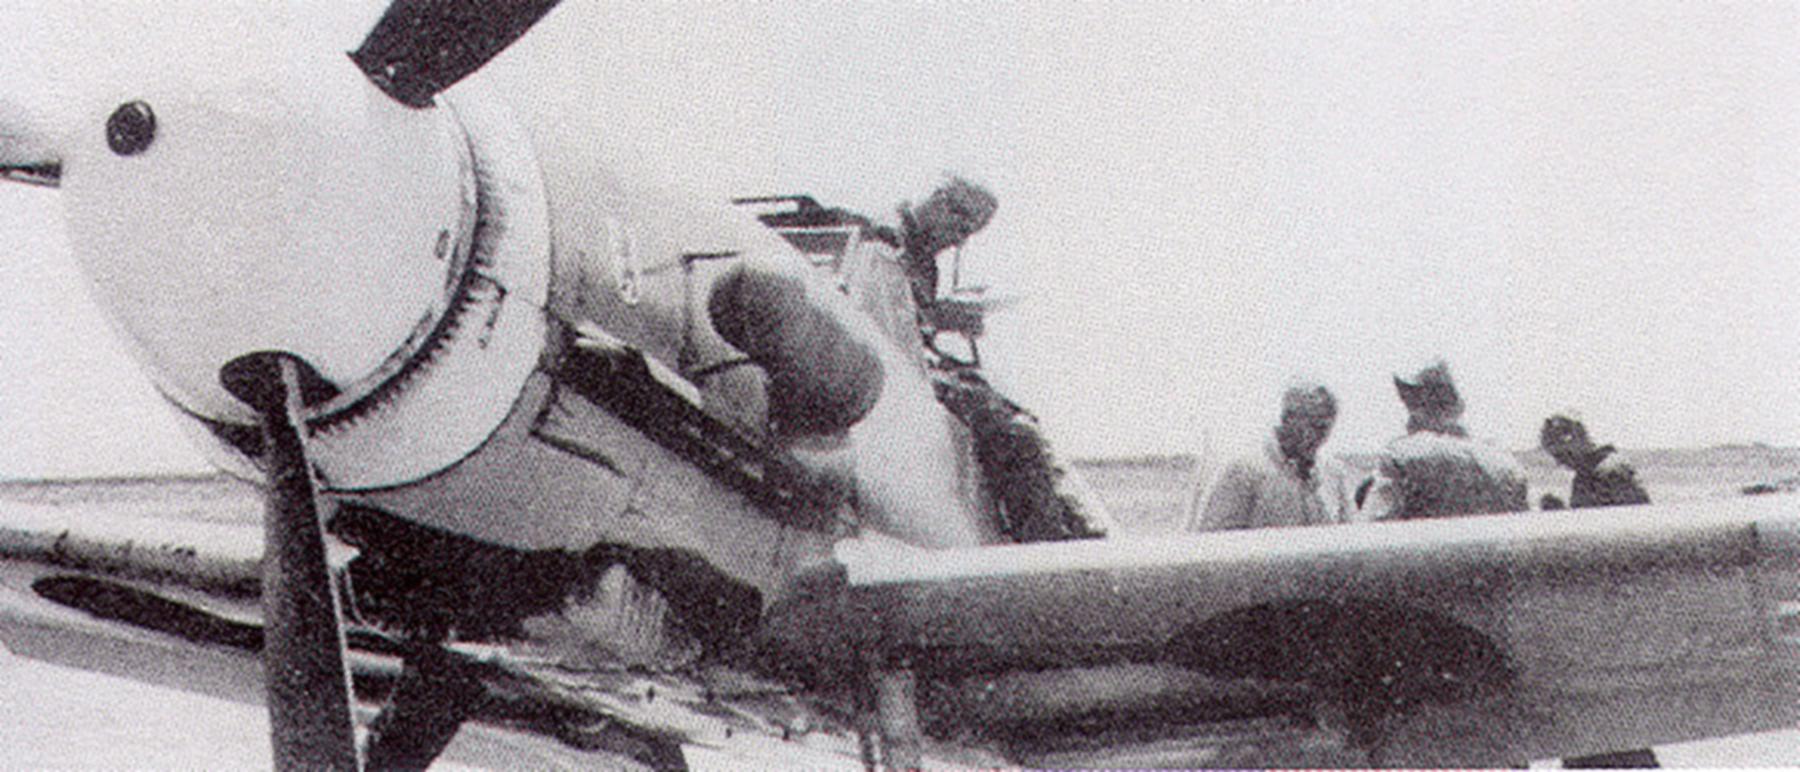 Messerschmitt Bf 109F4Trop 5.JG27 Black 4 Martuba Libya Feb 1942 04